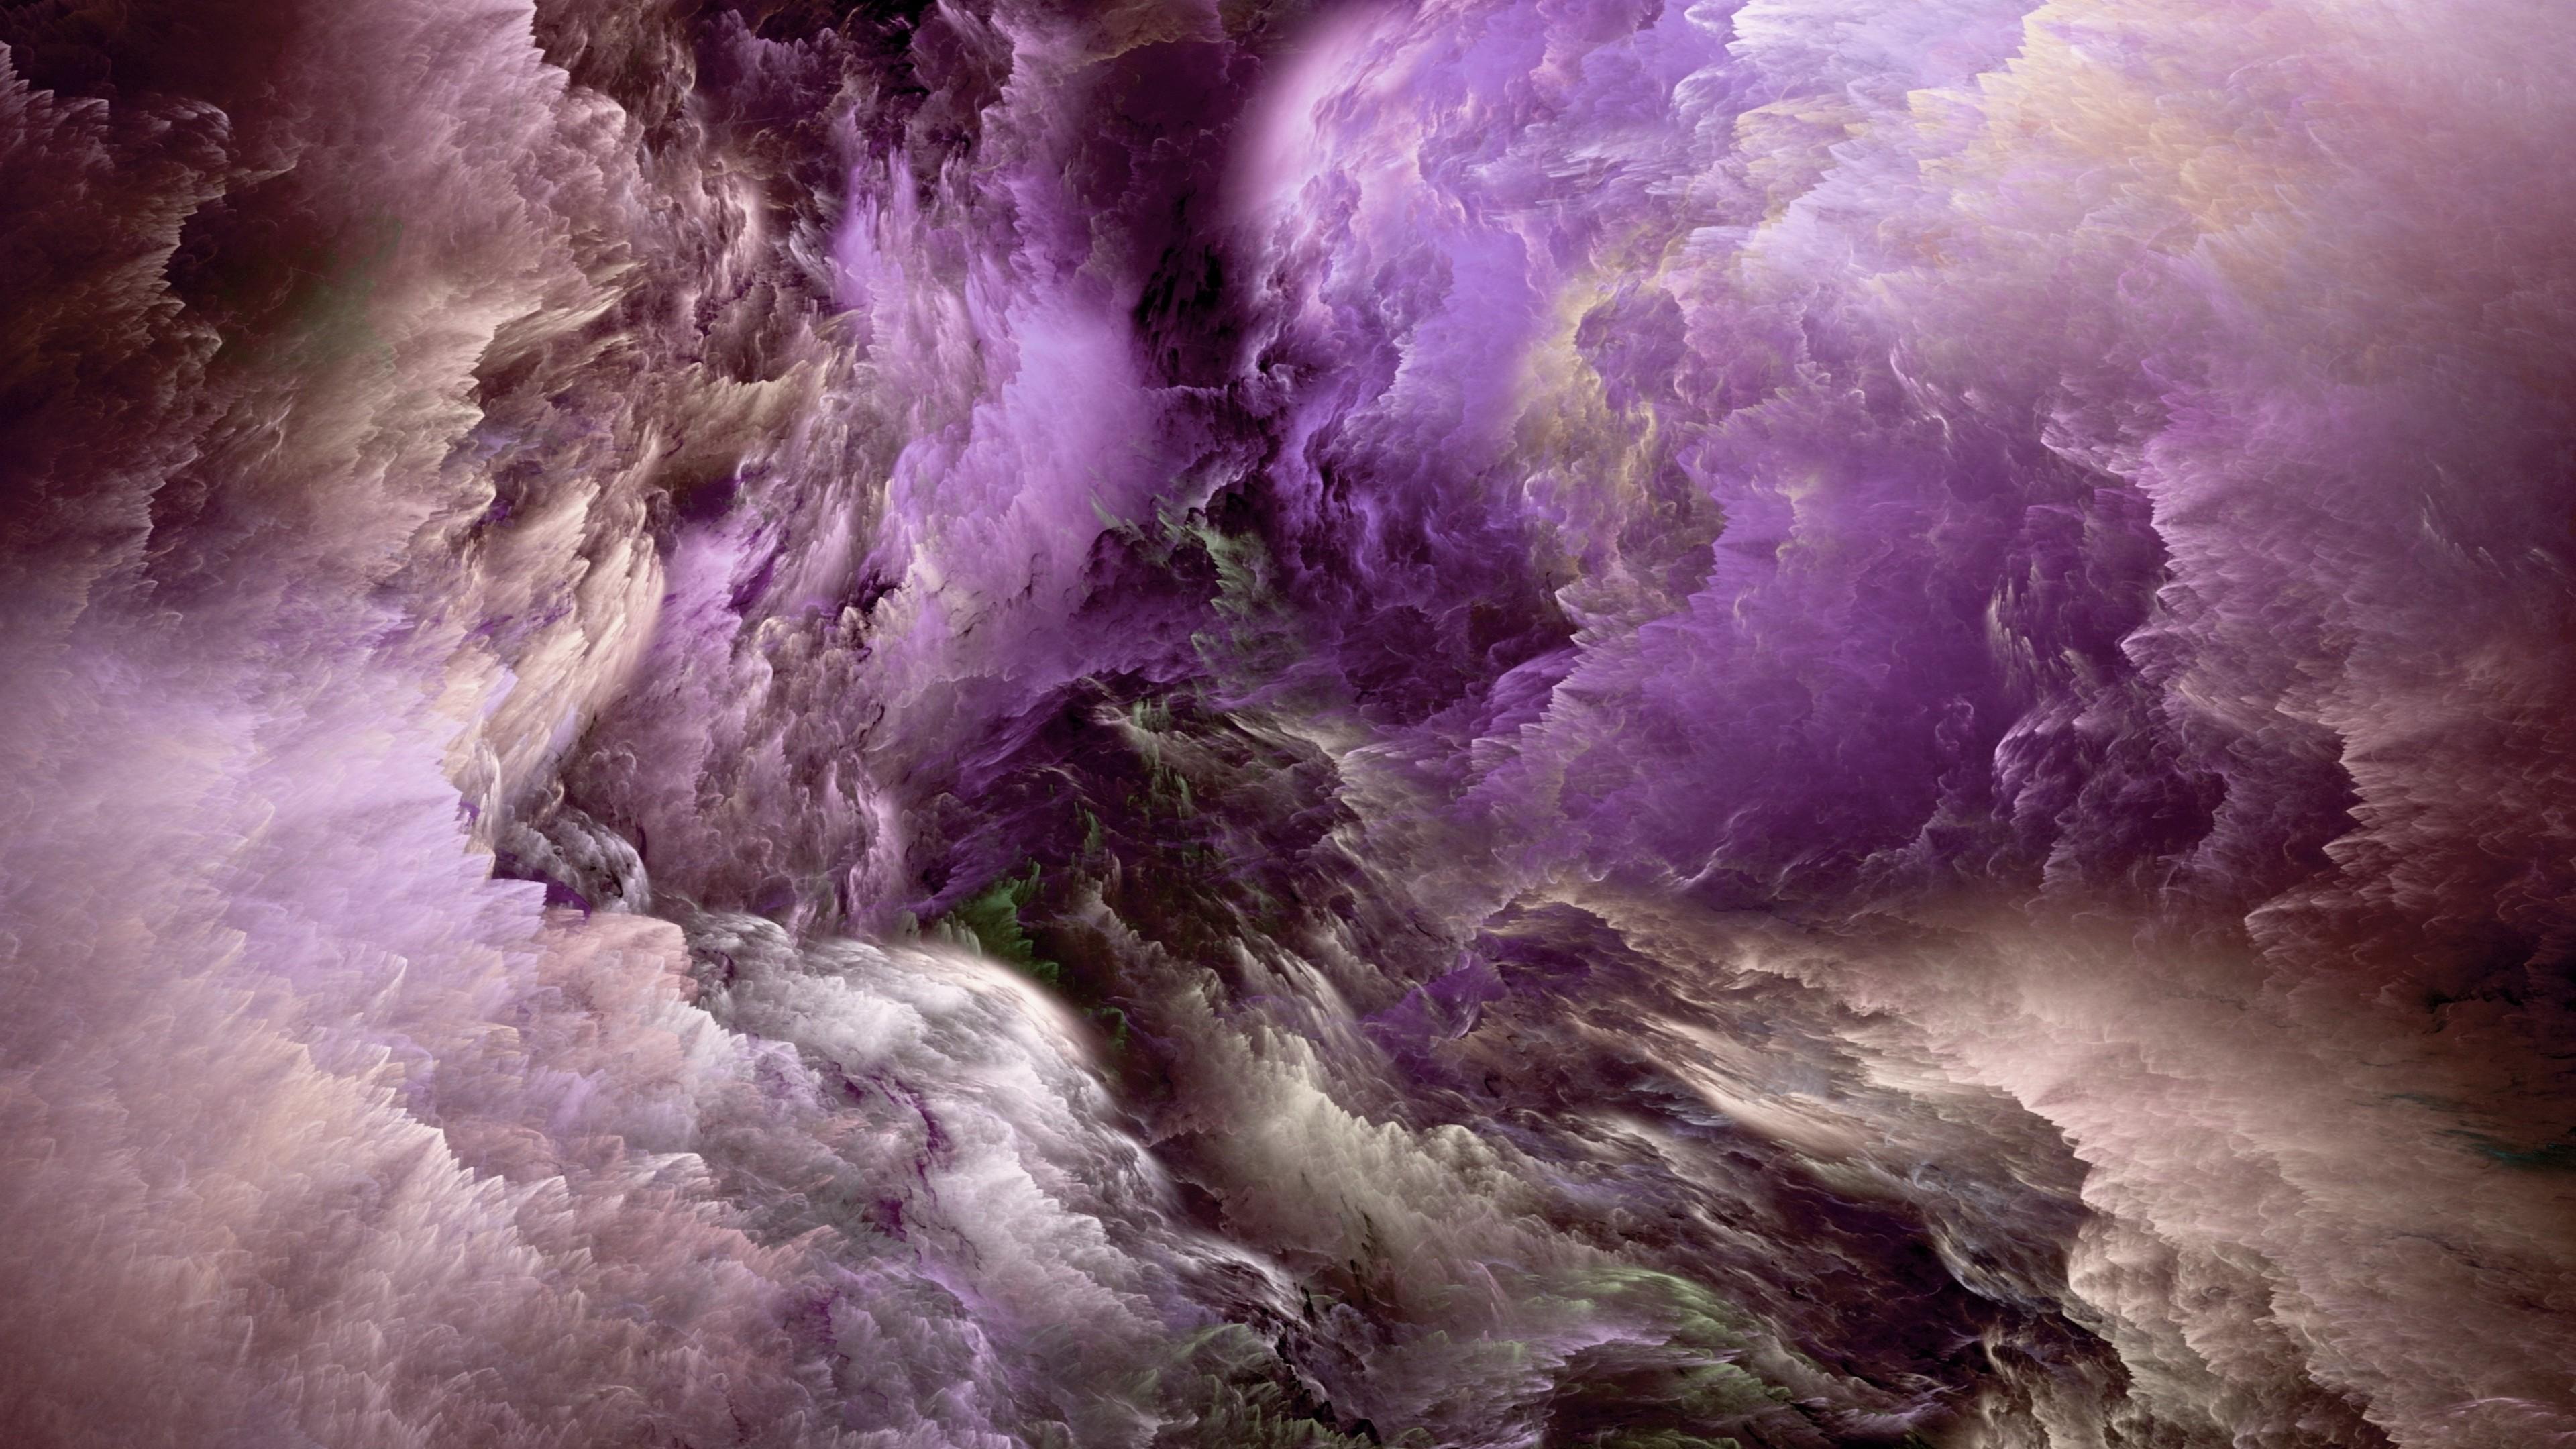 purple glowing clouds abstract 5k 1539371239 - Purple Glowing Clouds Abstract 5k - hd-wallpapers, glow wallpapers, colorful wallpapers, clouds wallpapers, abstract wallpapers, 5k wallpapers, 4k-wallpapers